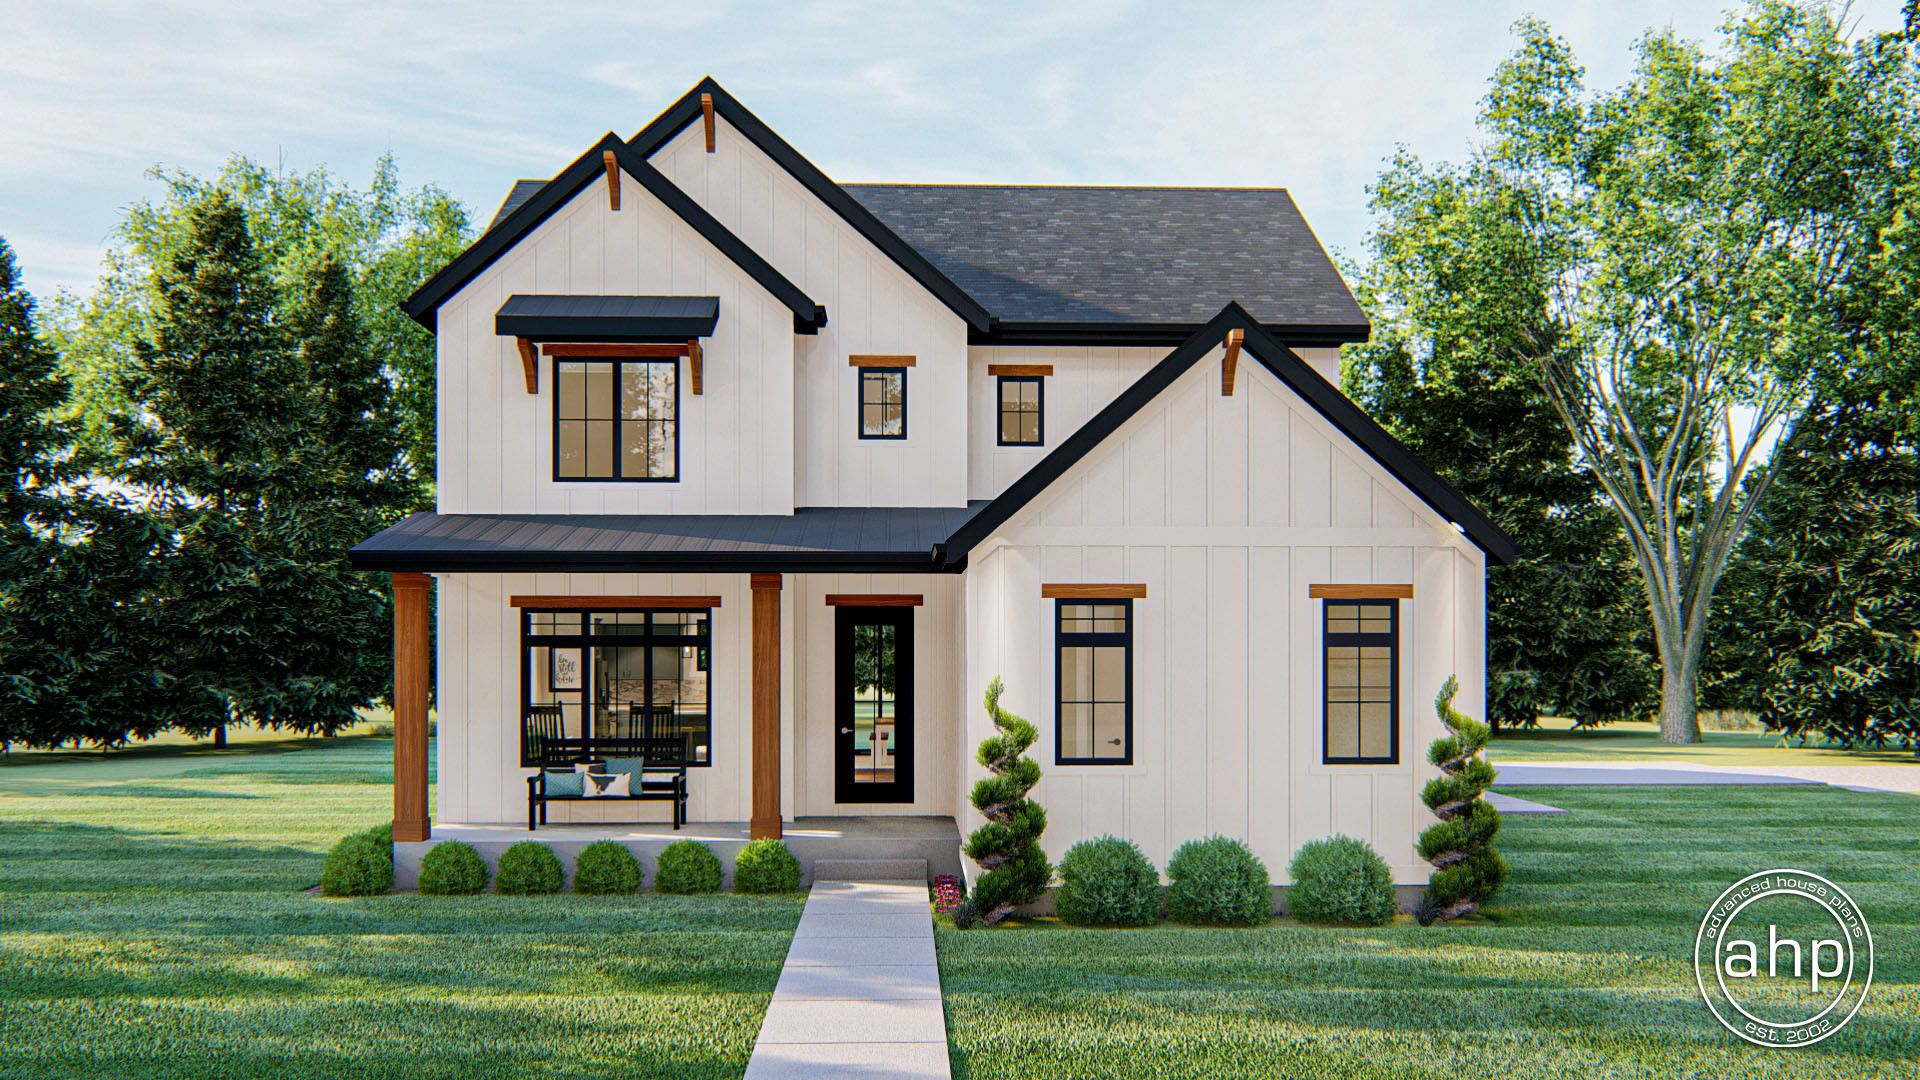 Applewood 1.5 Story Modern Farmhouse House Plan in 2020 ...